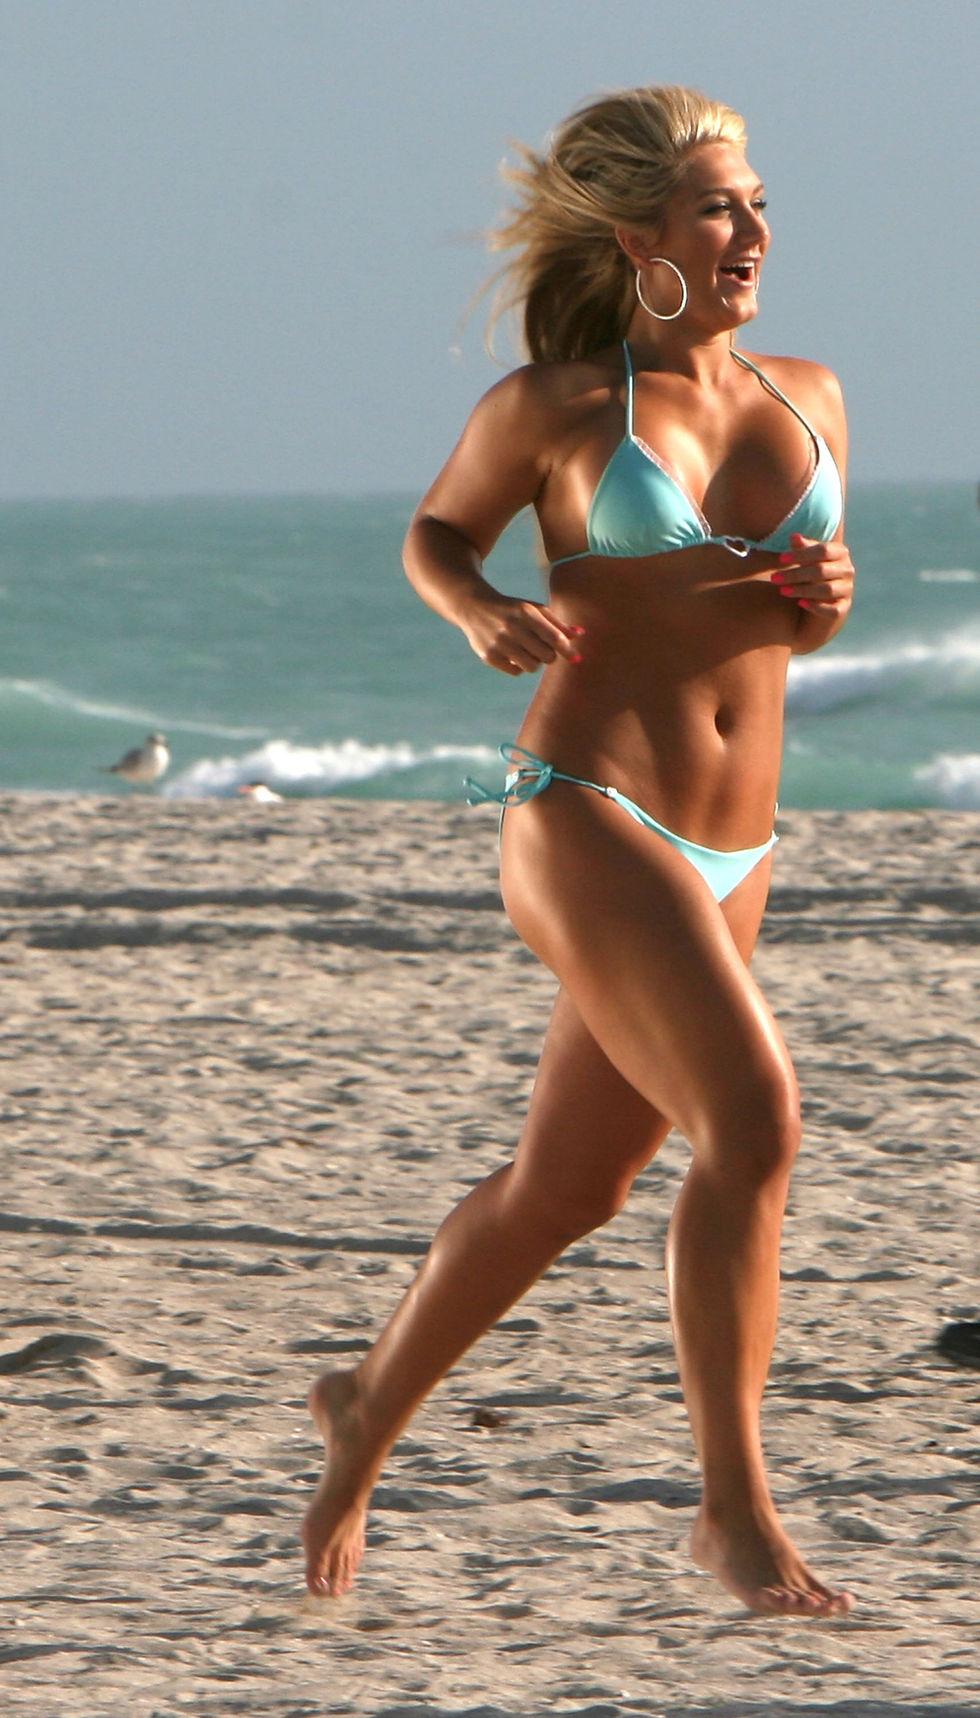 brooke-hogan-in-bikini-on-the-set-of-the-brooke-knows-best-in-miami-beach-01